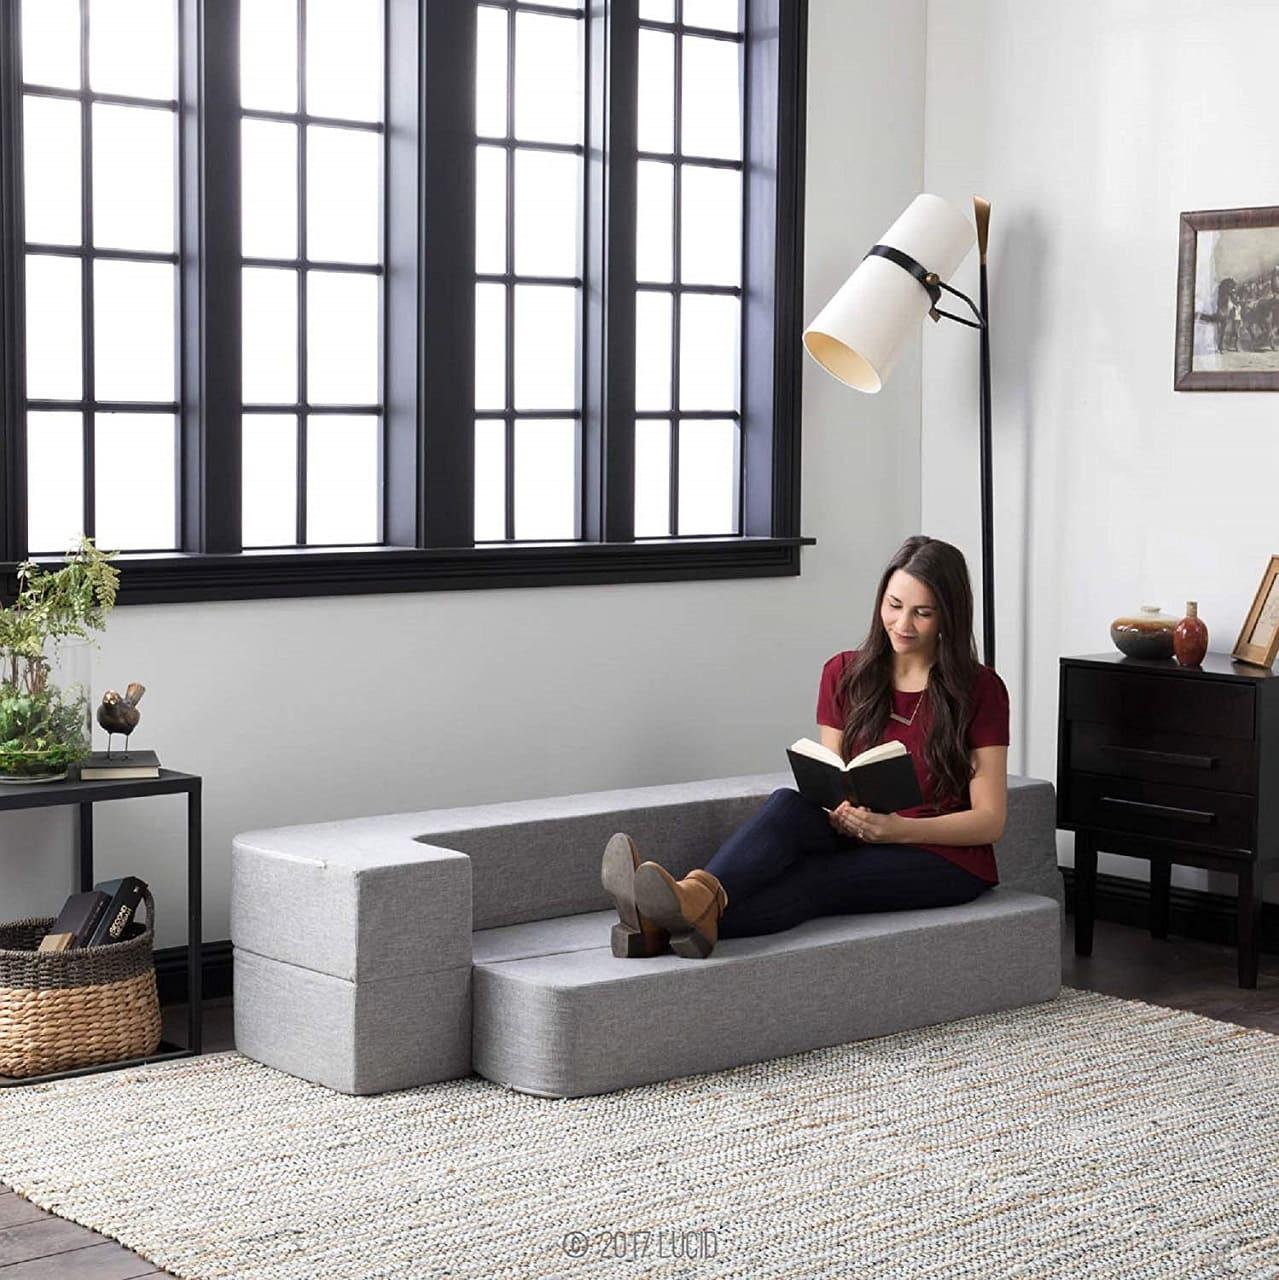 lucid convertible foam sofa image